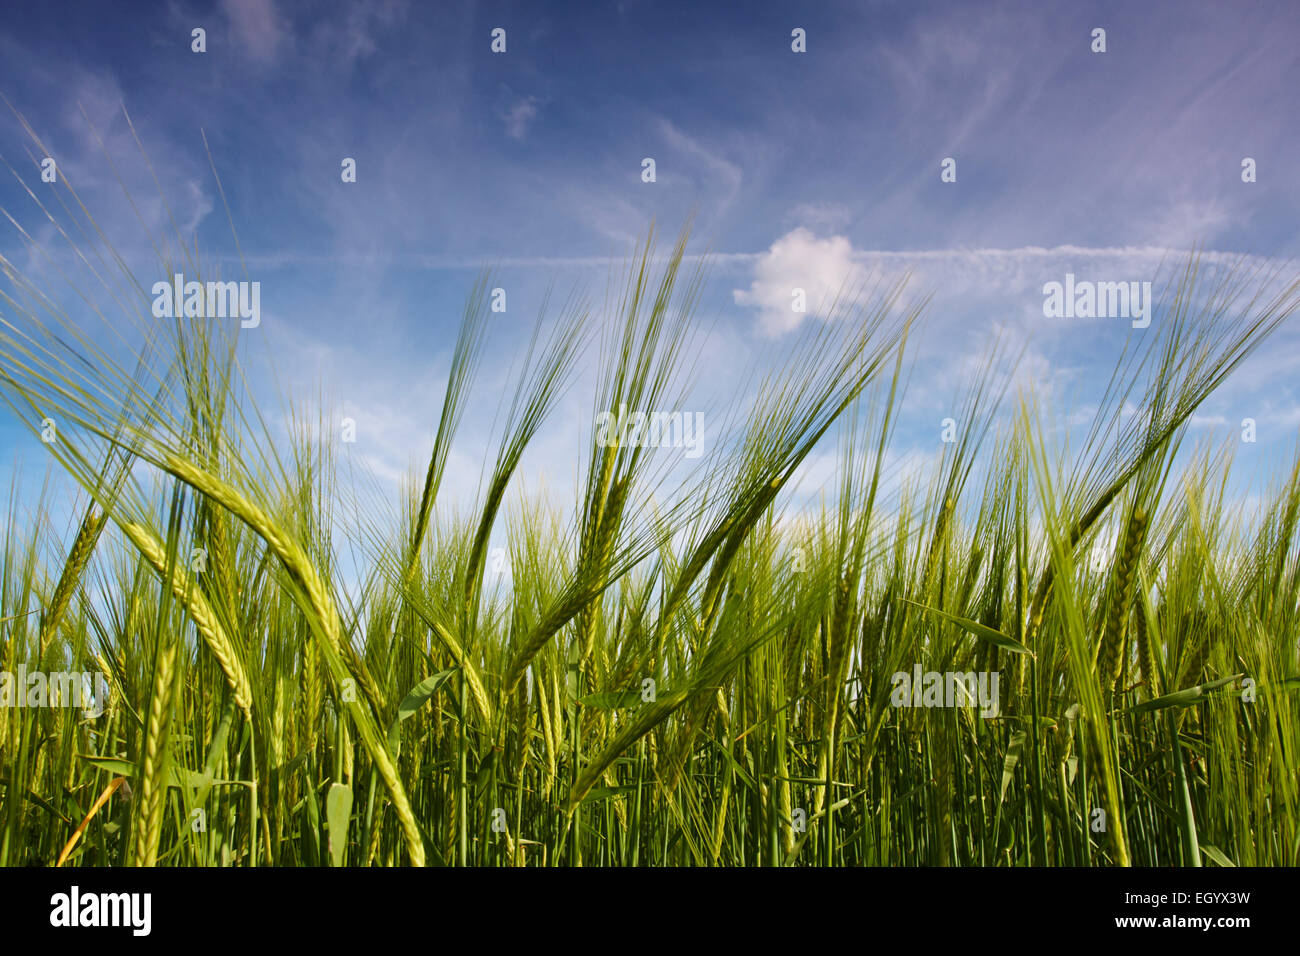 Cerca de espigas de cebada crece en un campo de Norfolk. Imagen De Stock